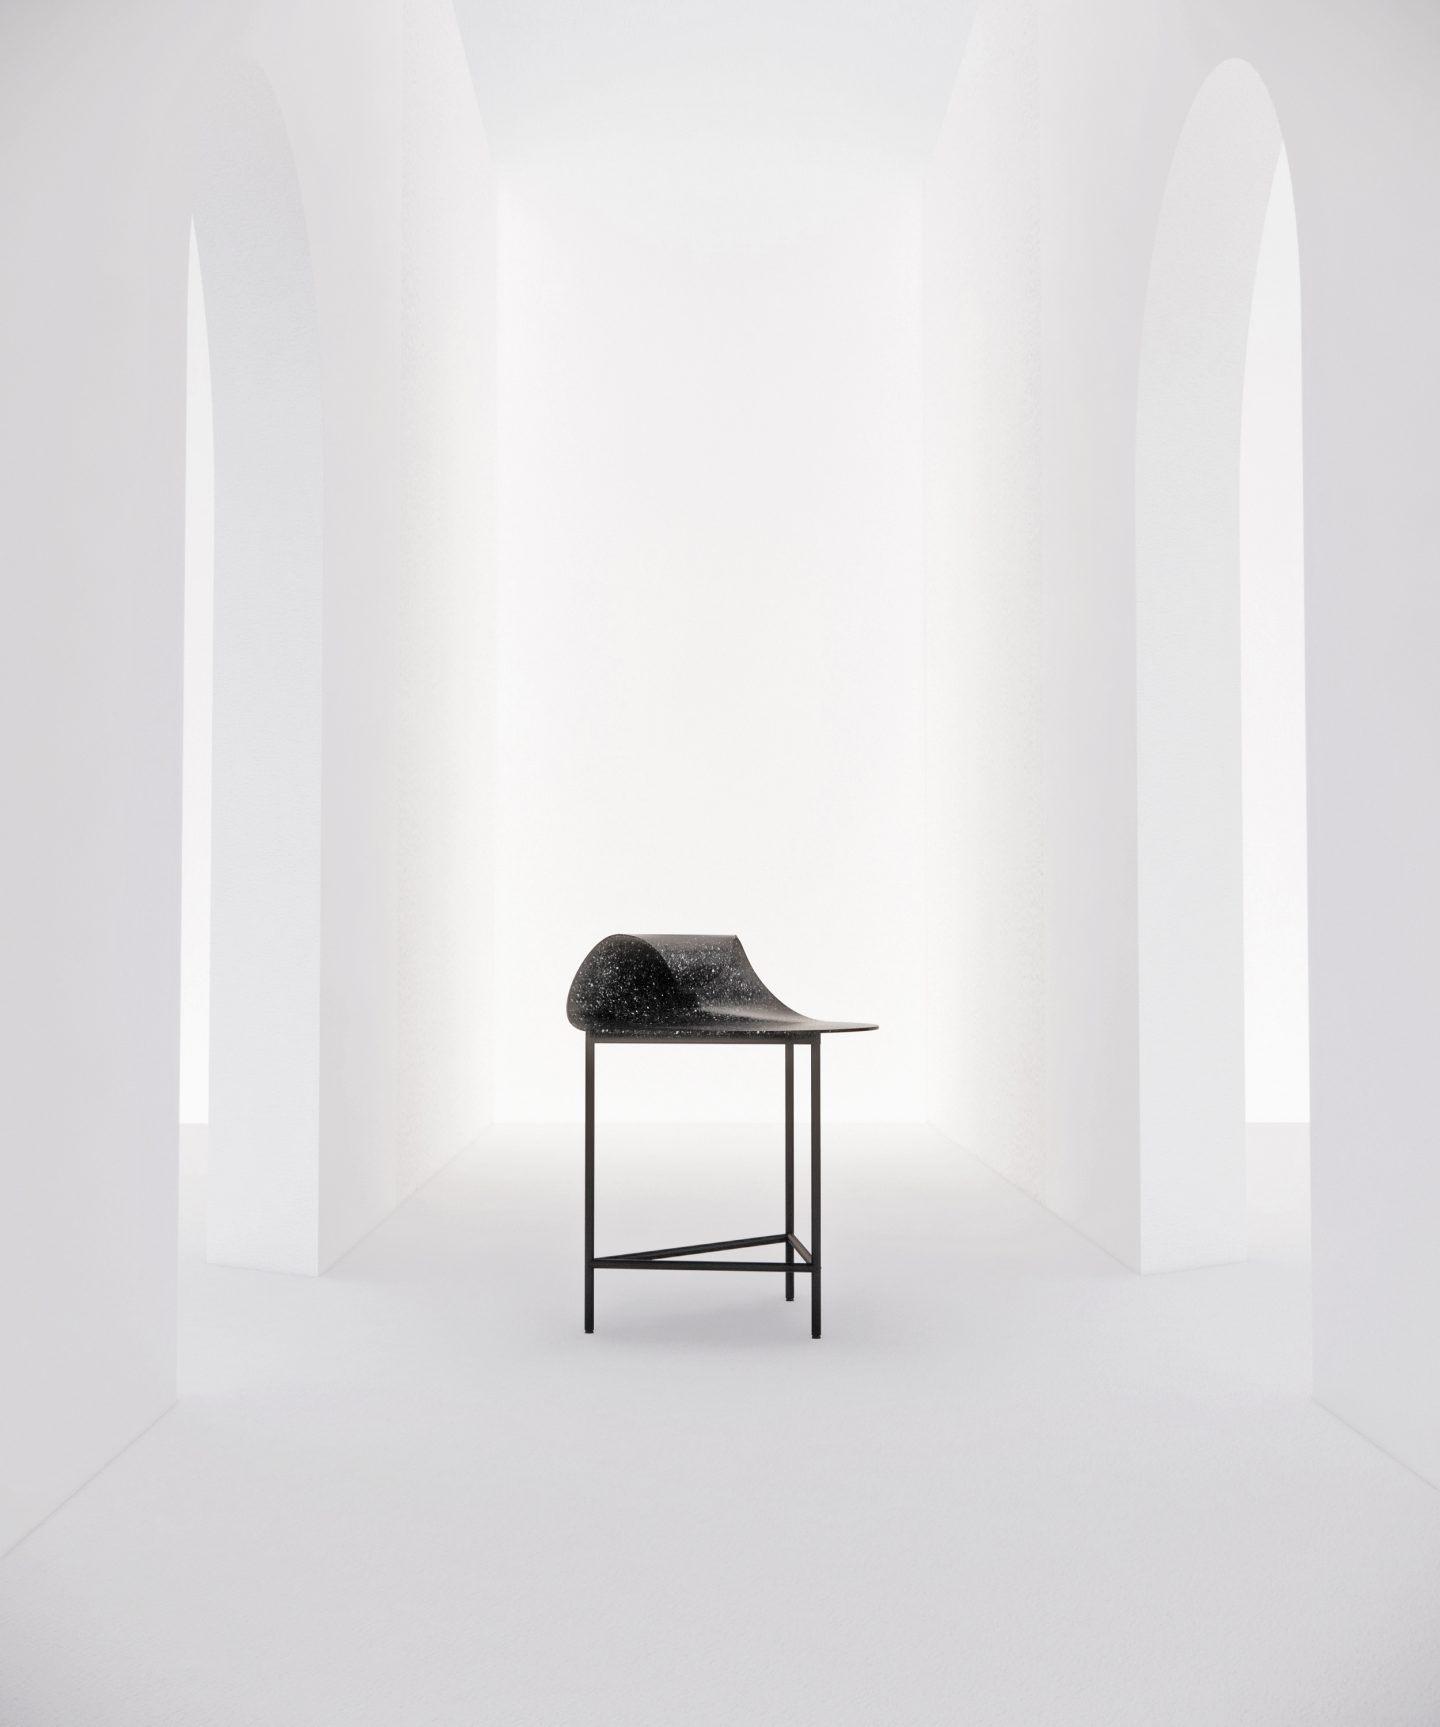 IGNANT-Design-Sodo-Sopa-Broadleaf-Stool-02